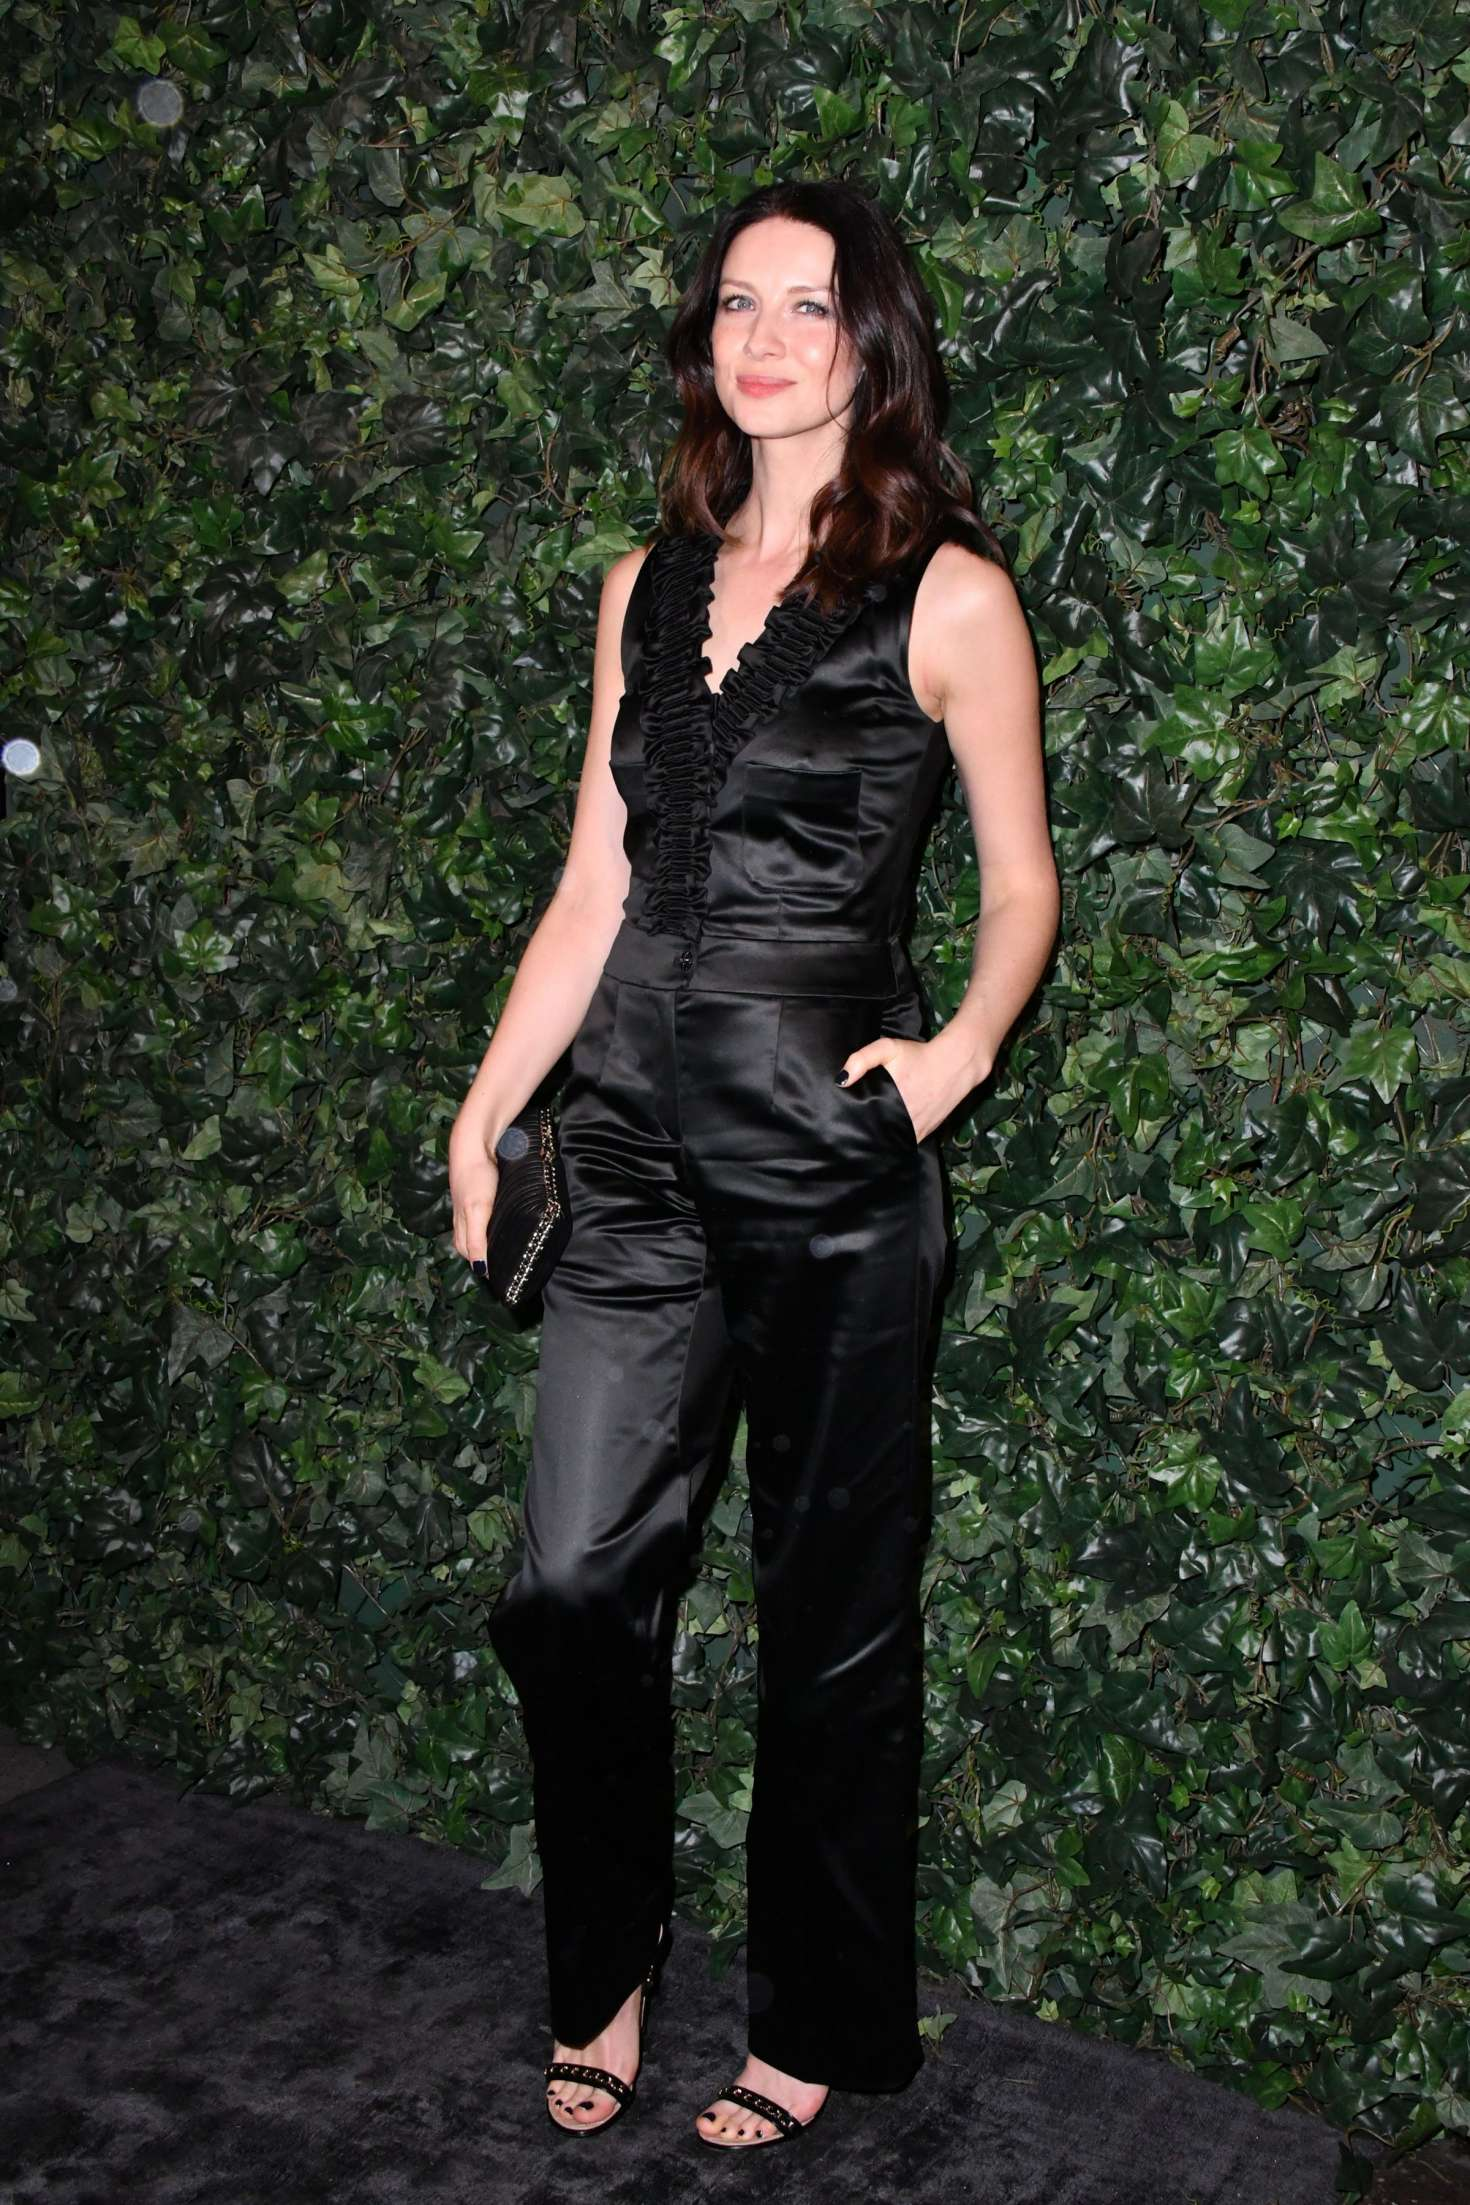 Caitriona Balfe Harvey Weinstein Pre Baftas Dinner 03 Lucy Boynton Bikini